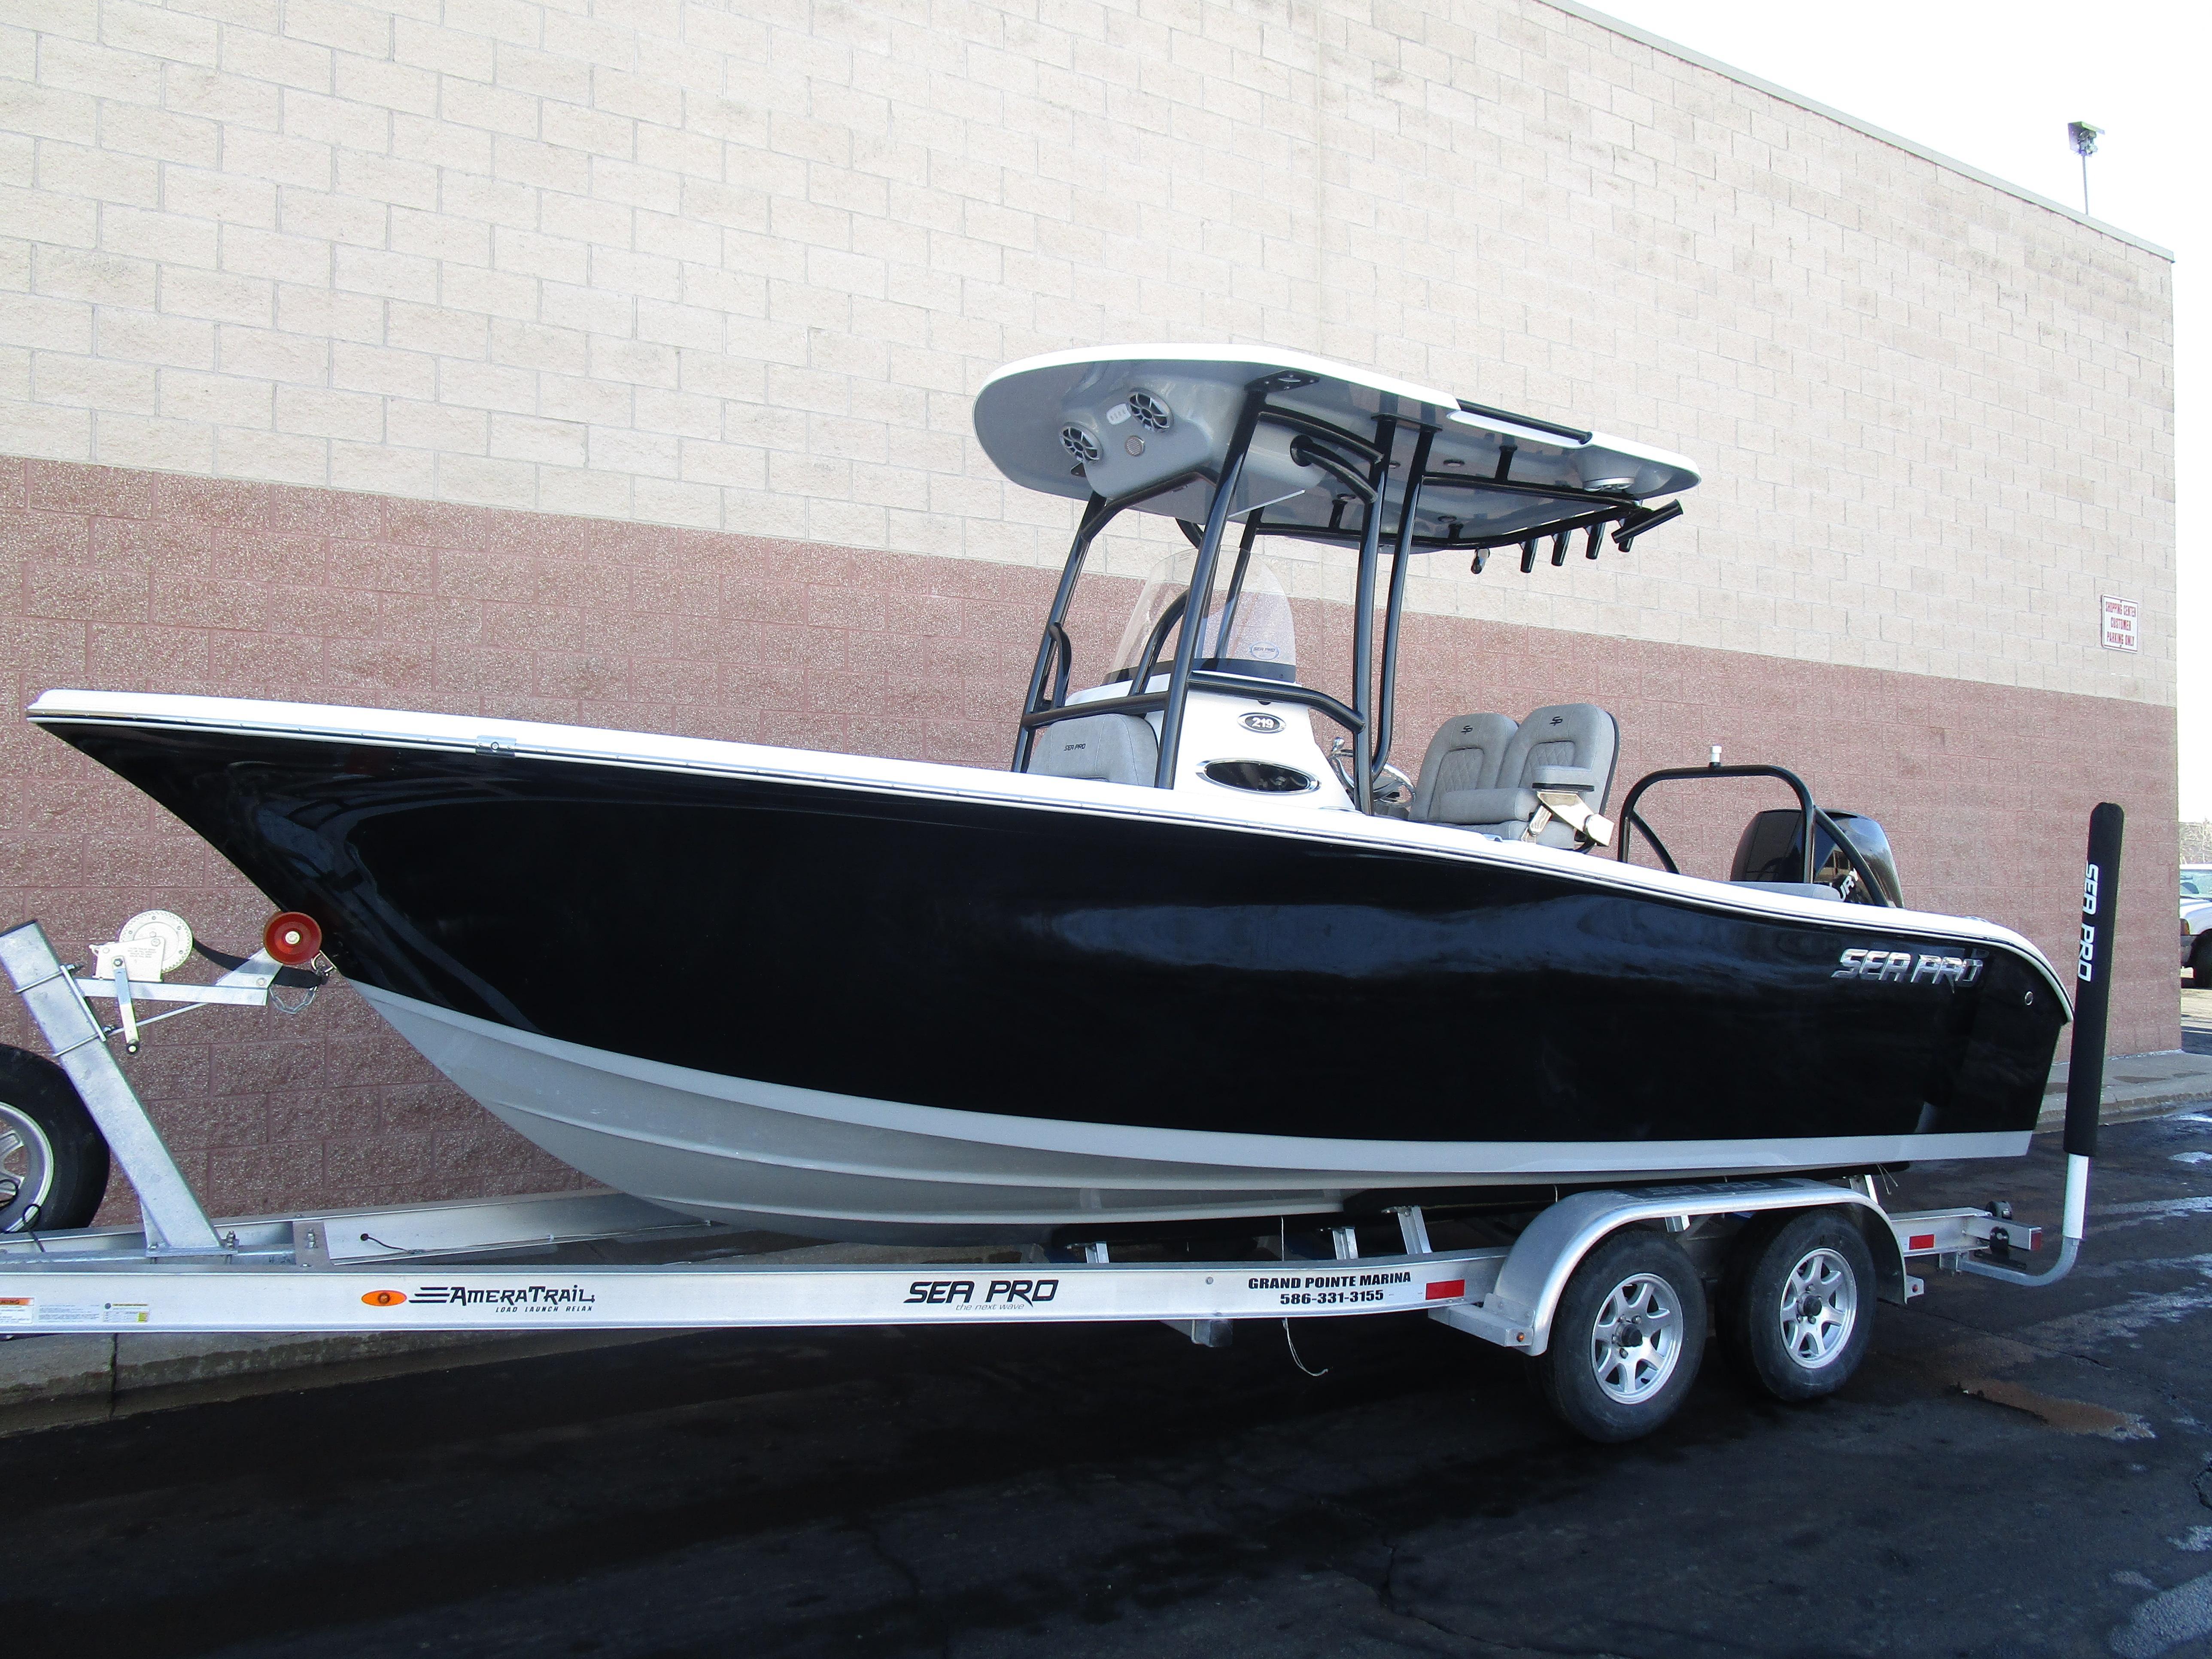 Sea Pro219 CC